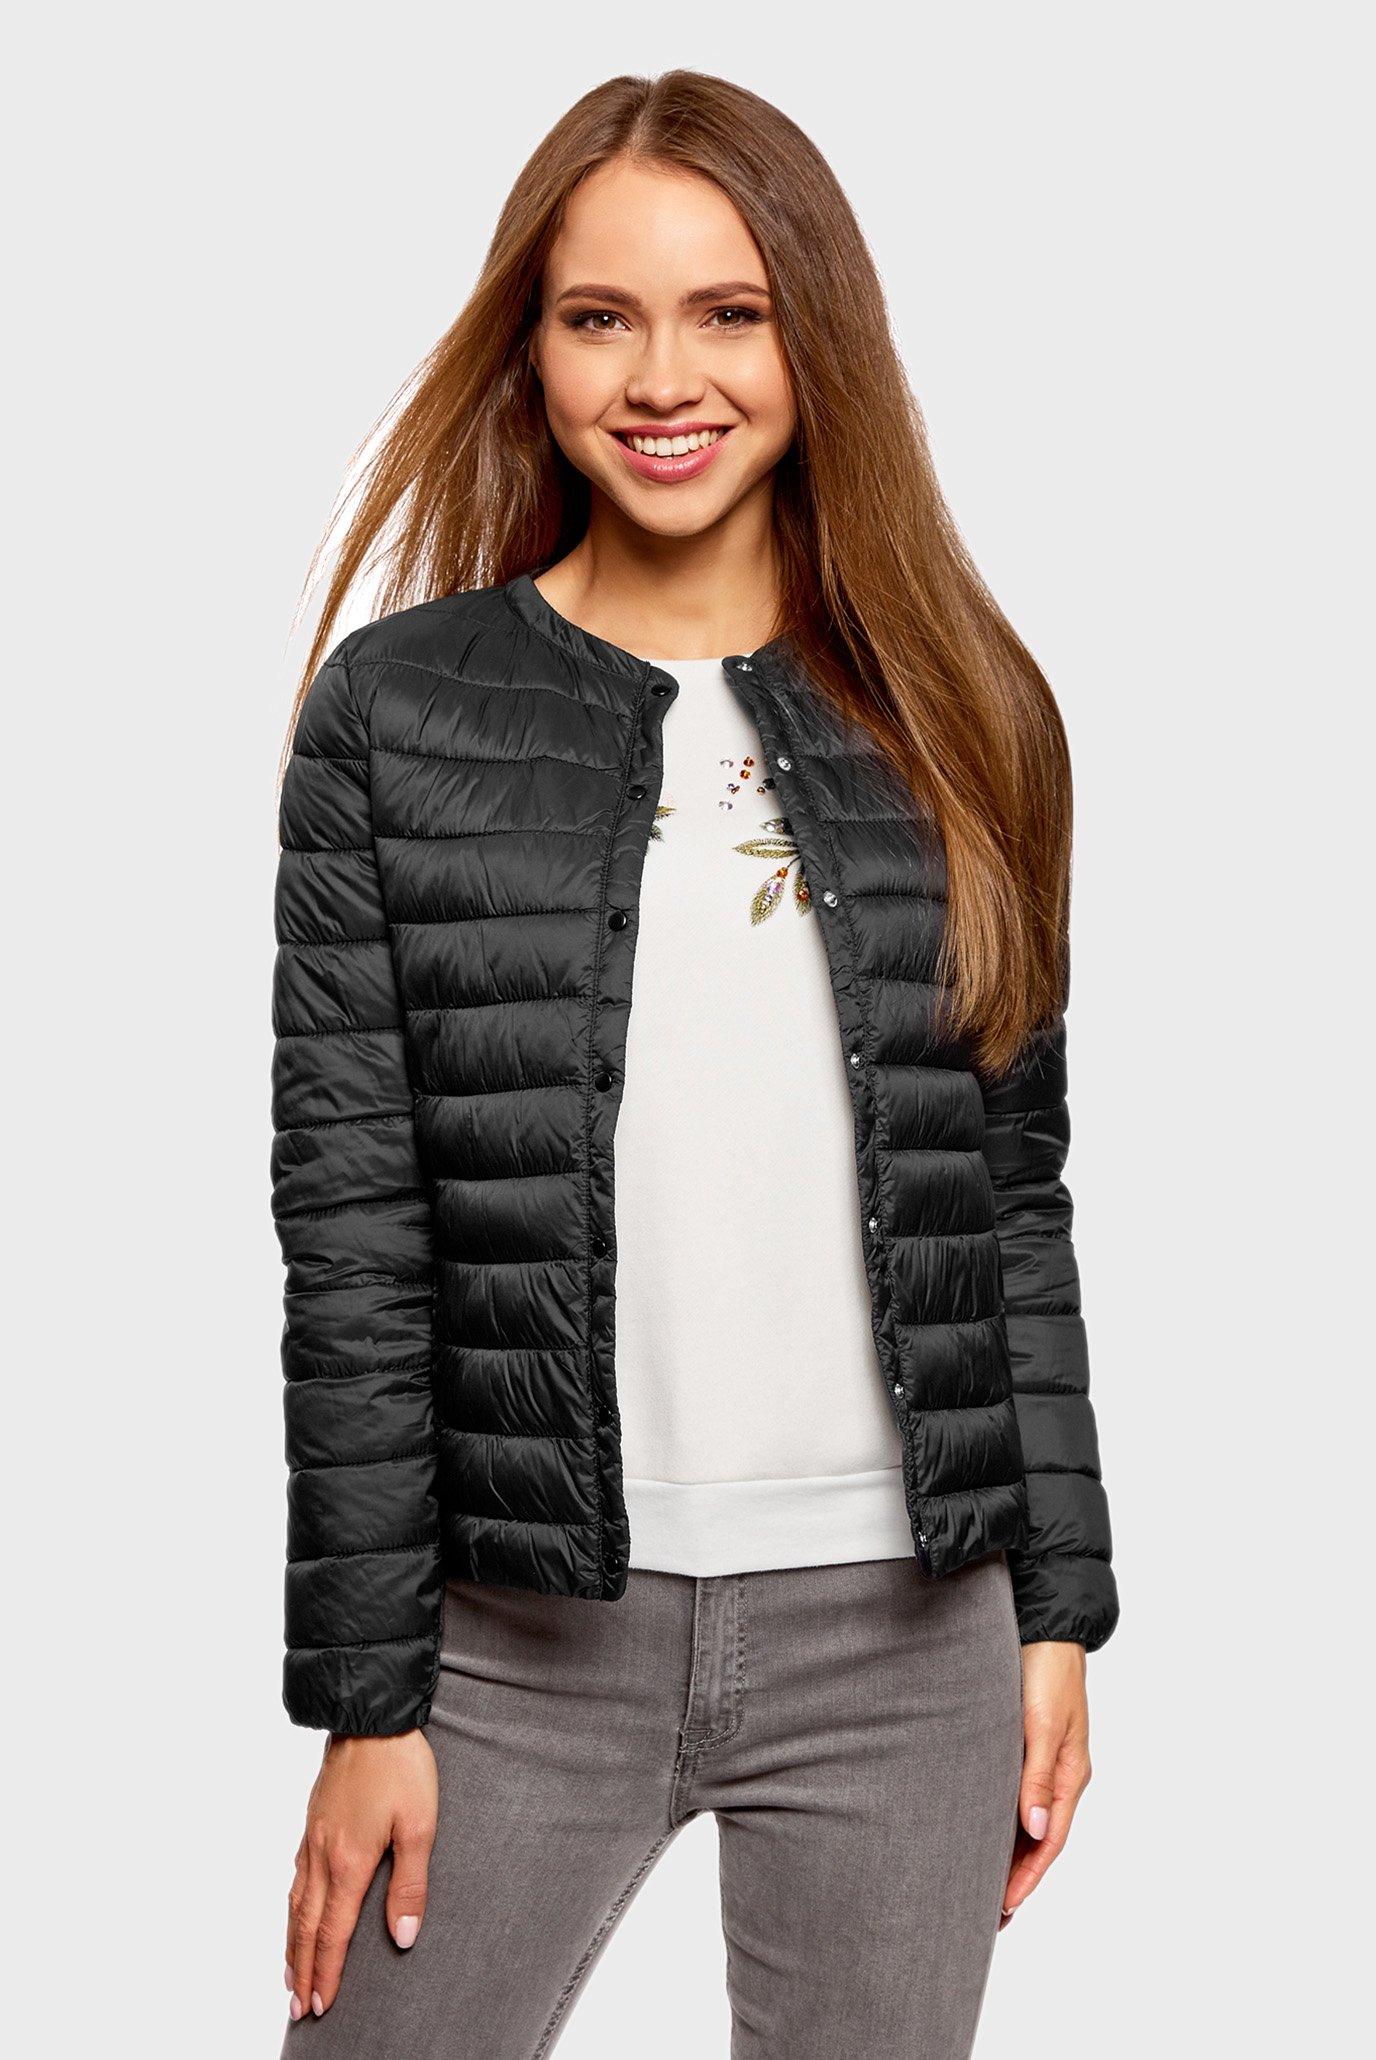 9a4152a73f0 Купить Женская черная стеганая куртка Oodji Oodji 10204040B 45638 2900N –  Киев